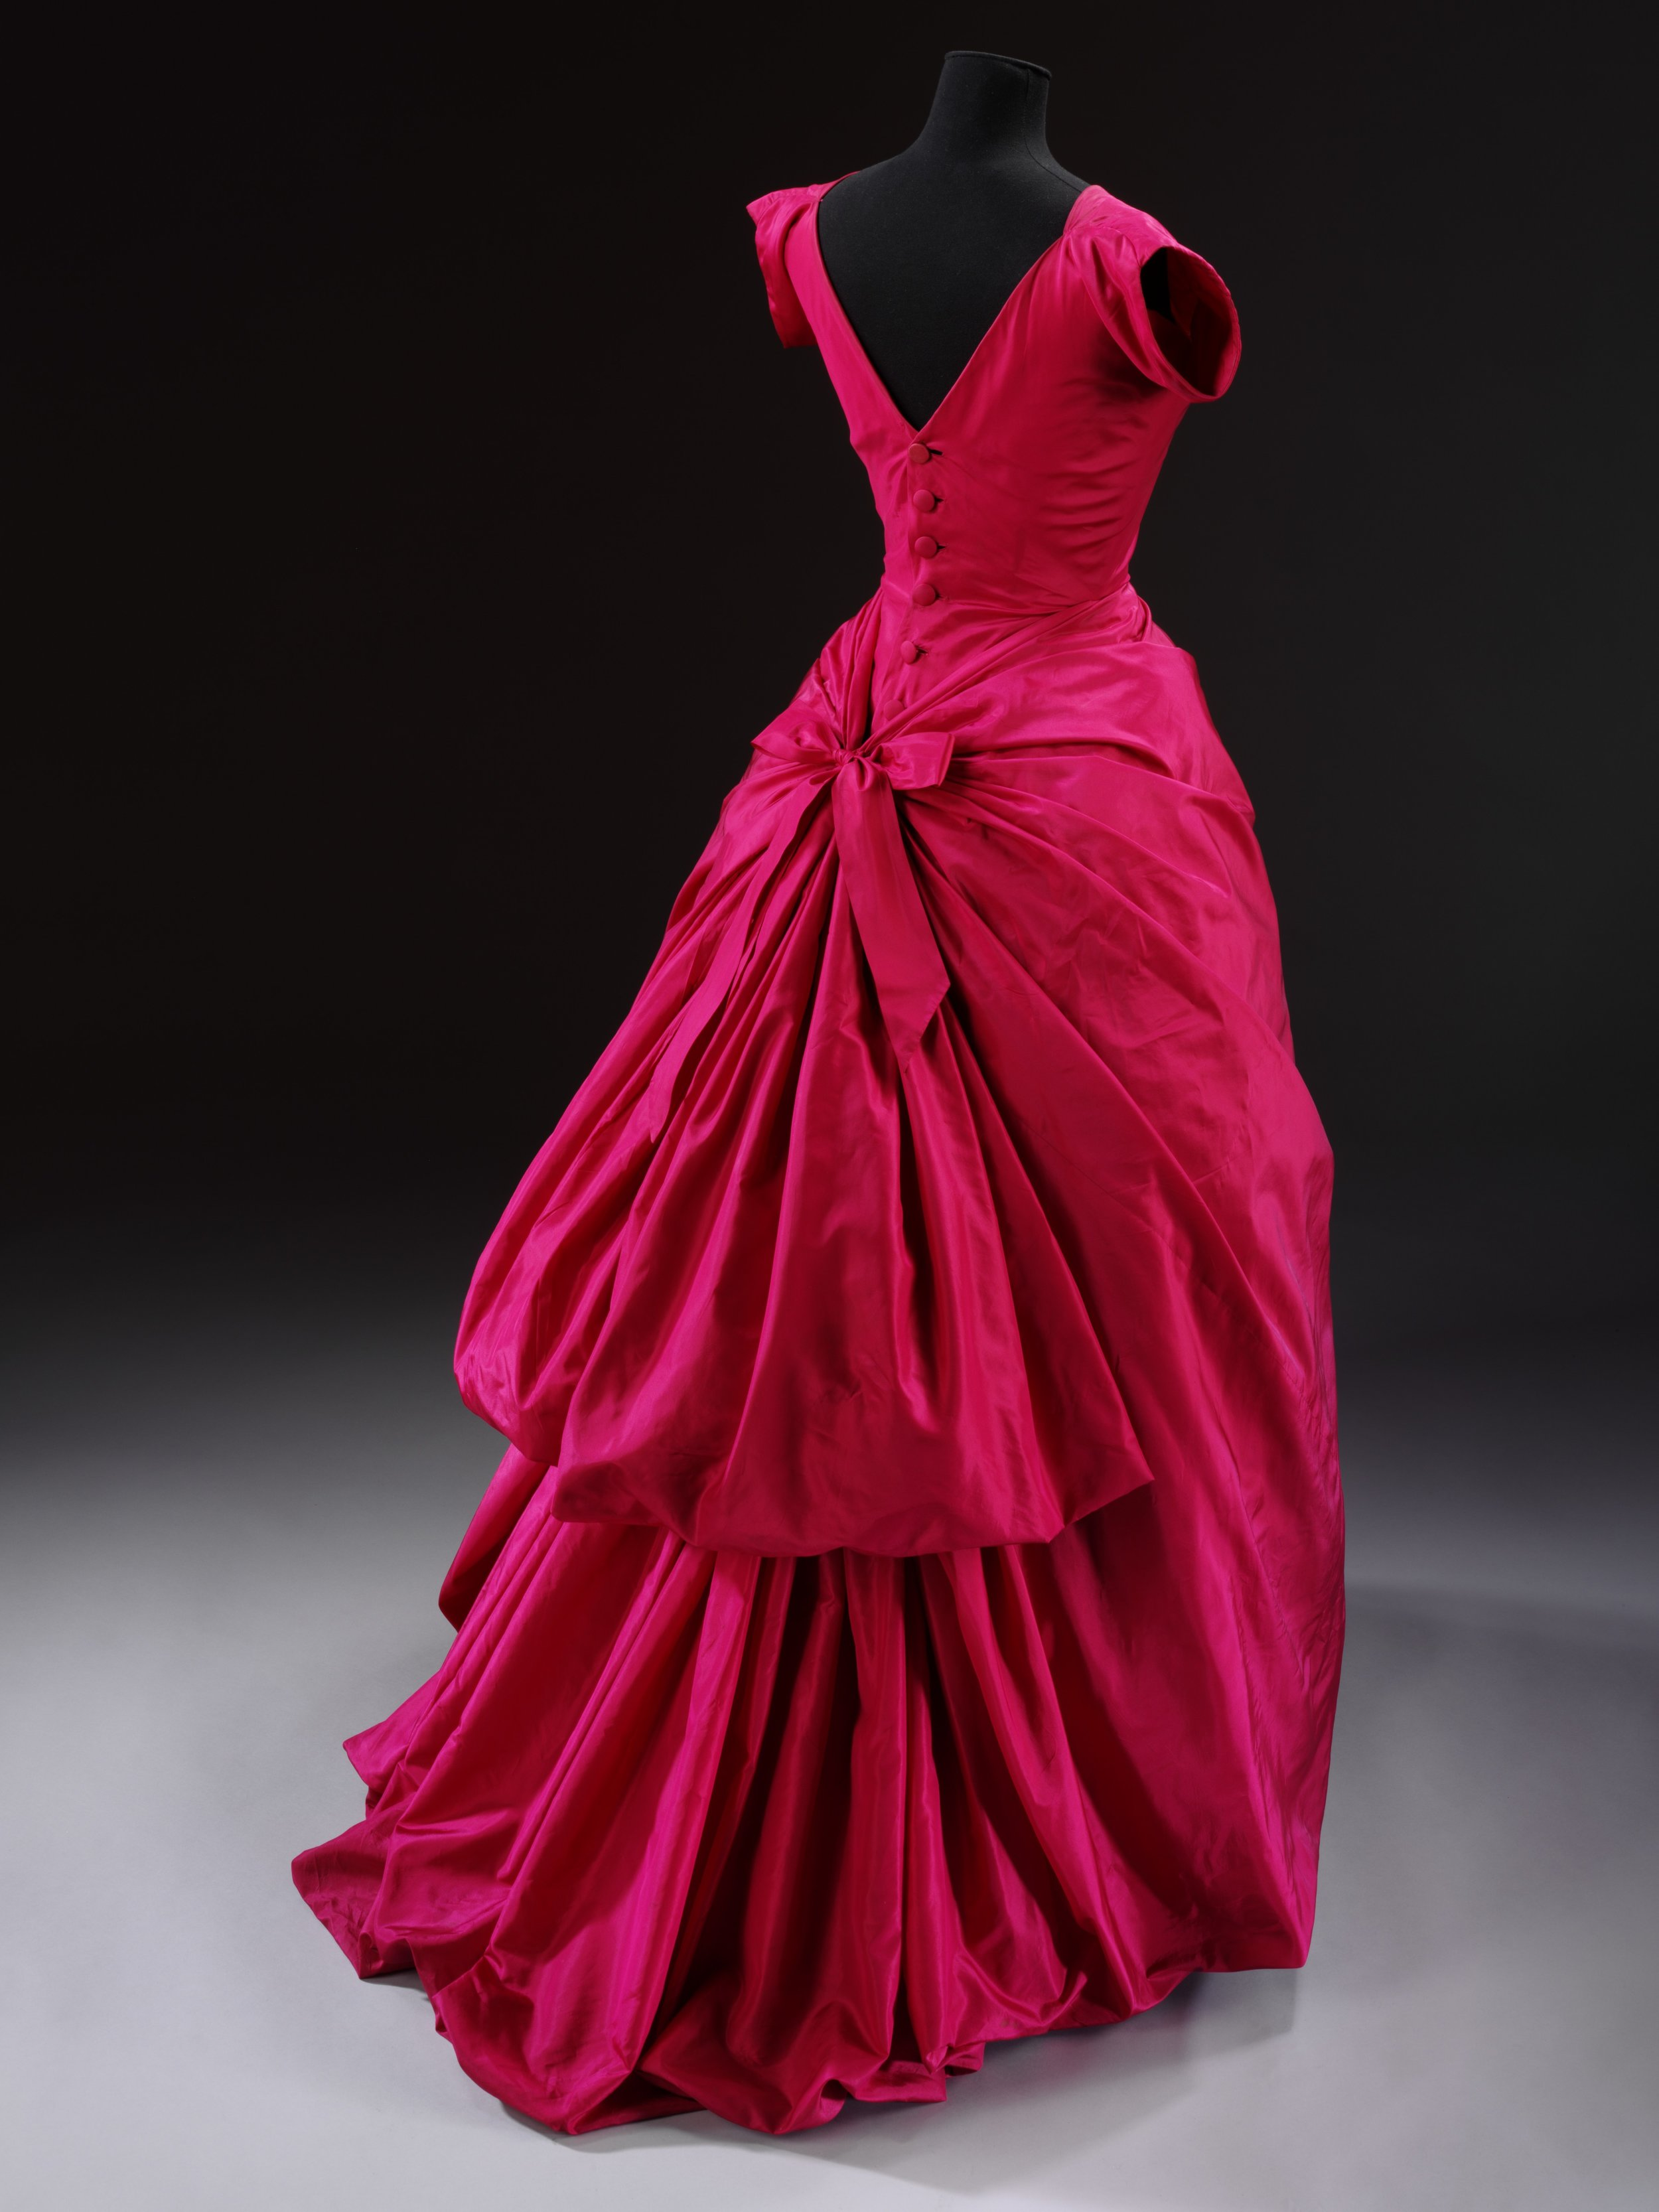 Evening dress, silk taffeta, Cristóbal Balenciaga, Paris, 1955 © Victoria and Albert Museum, London.